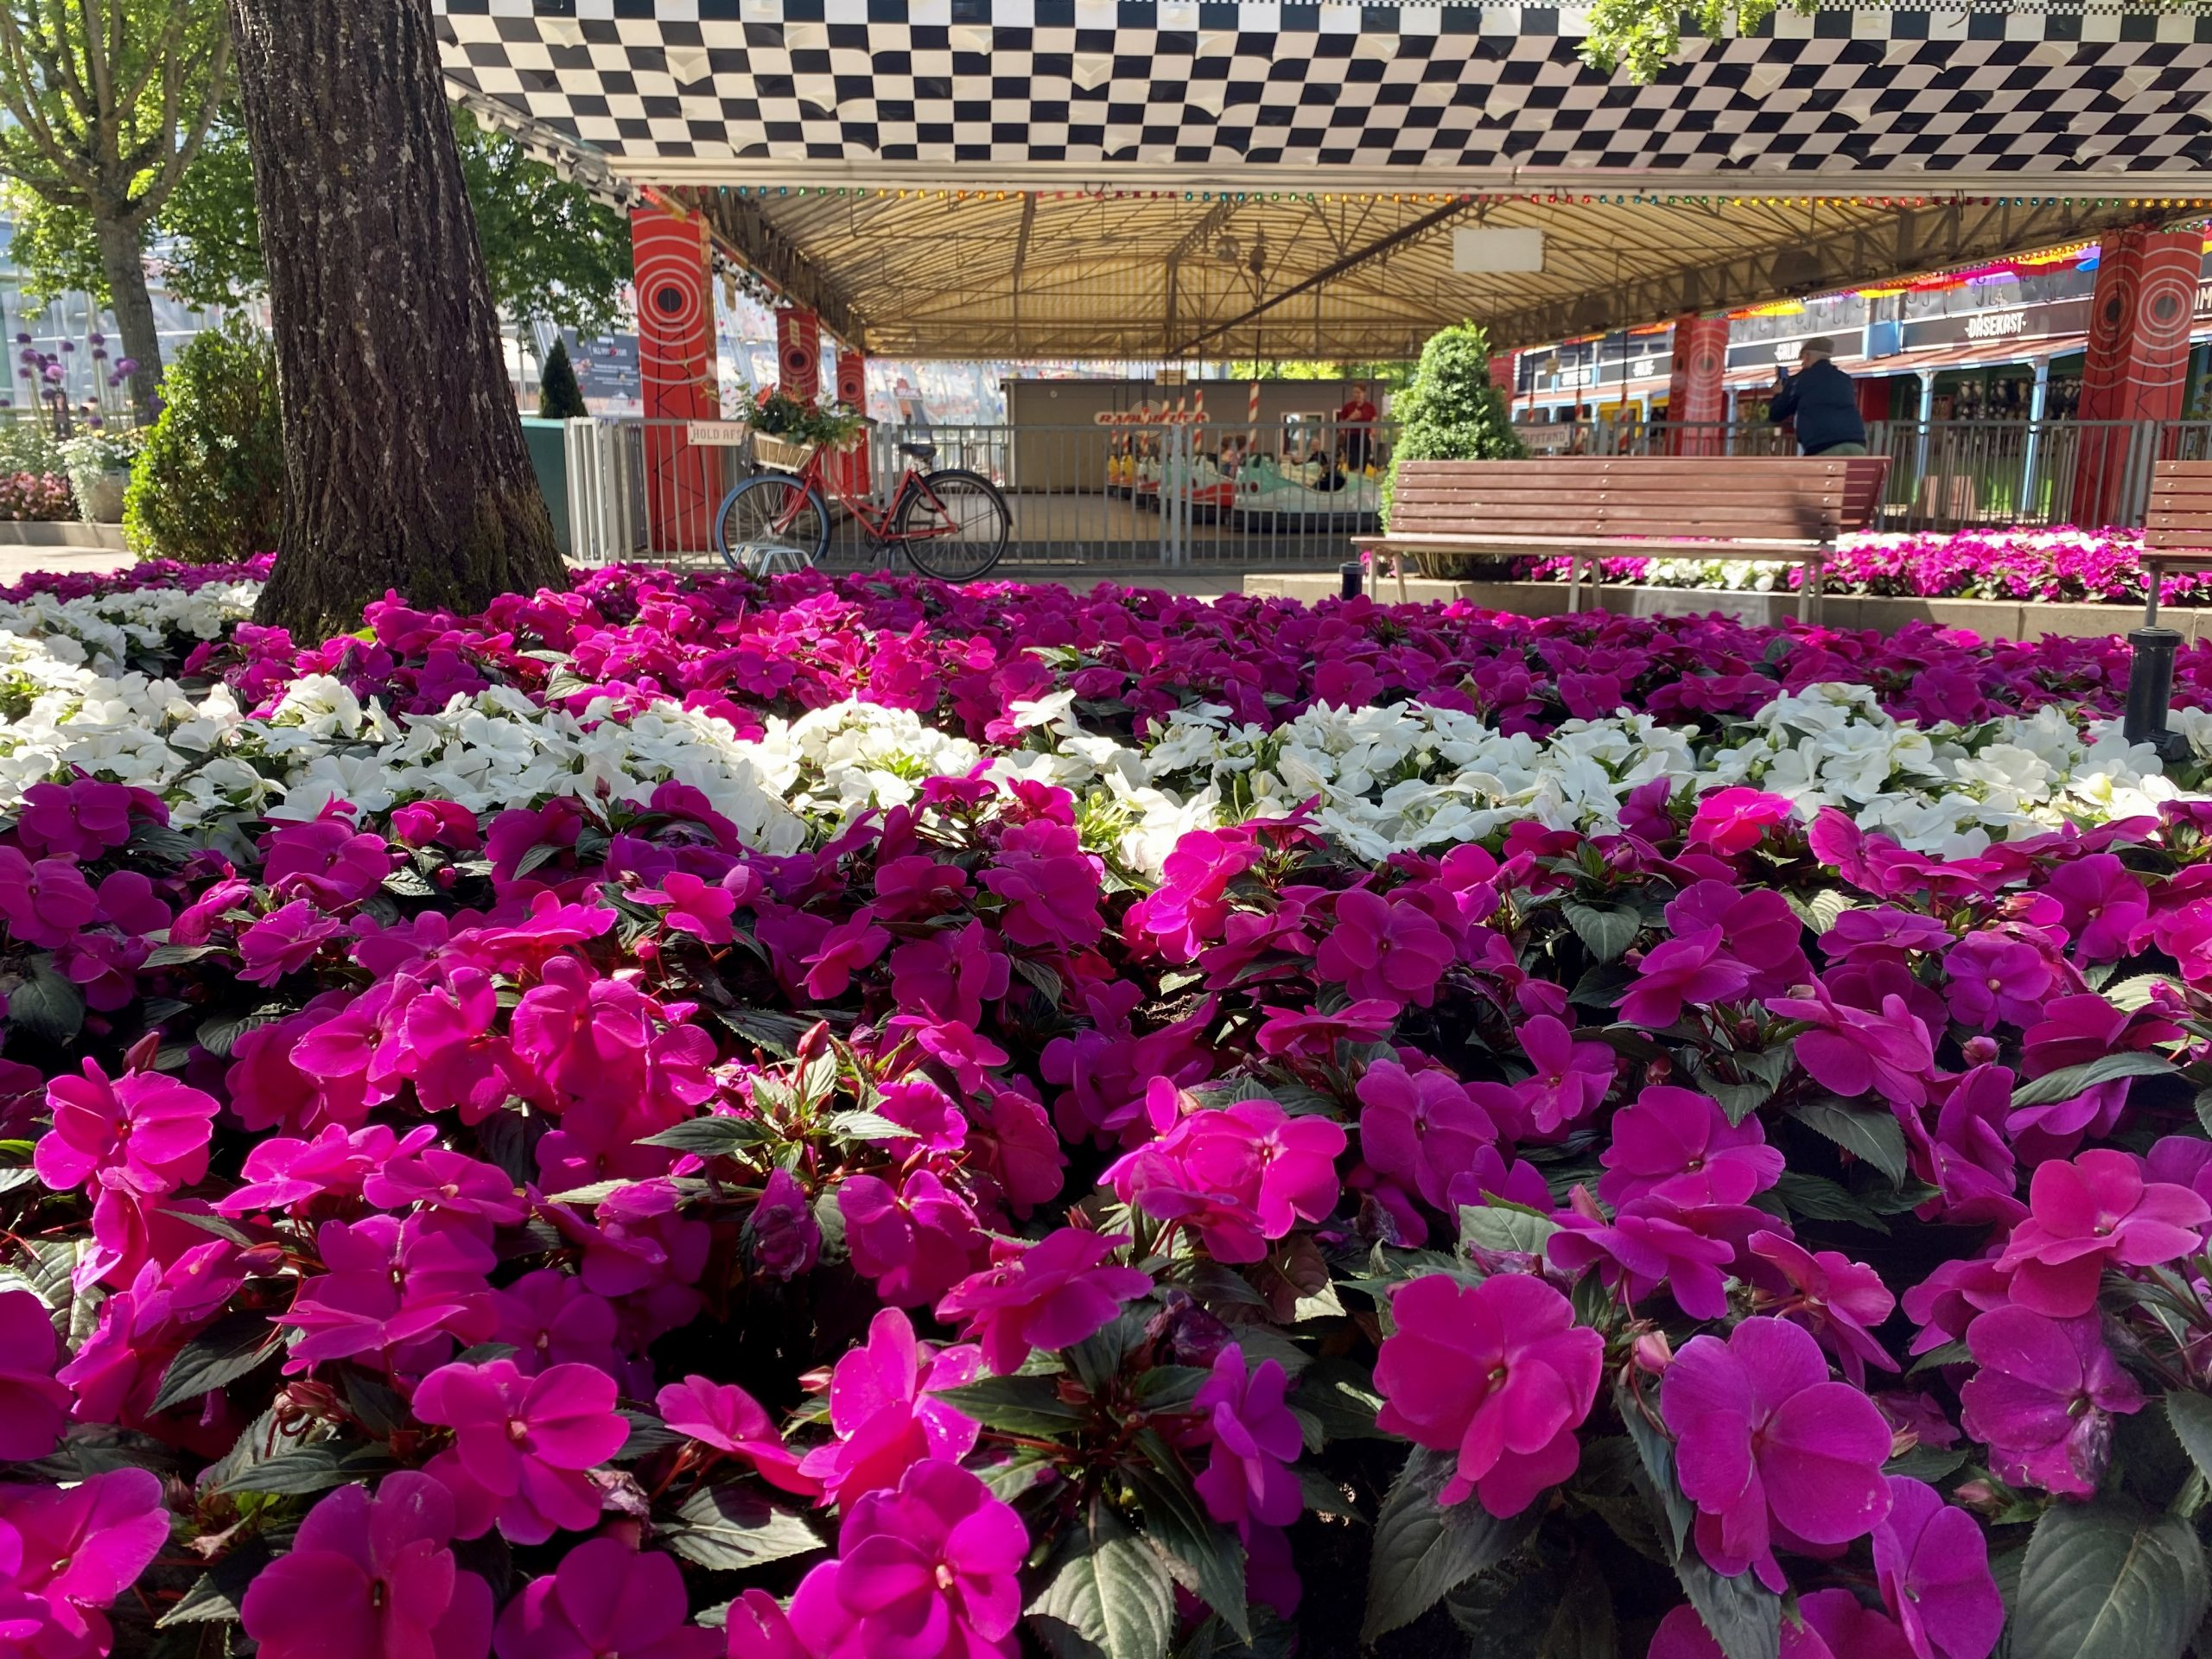 En sand farveeksplosion: Blomsterfestival i Tivoli Friheden